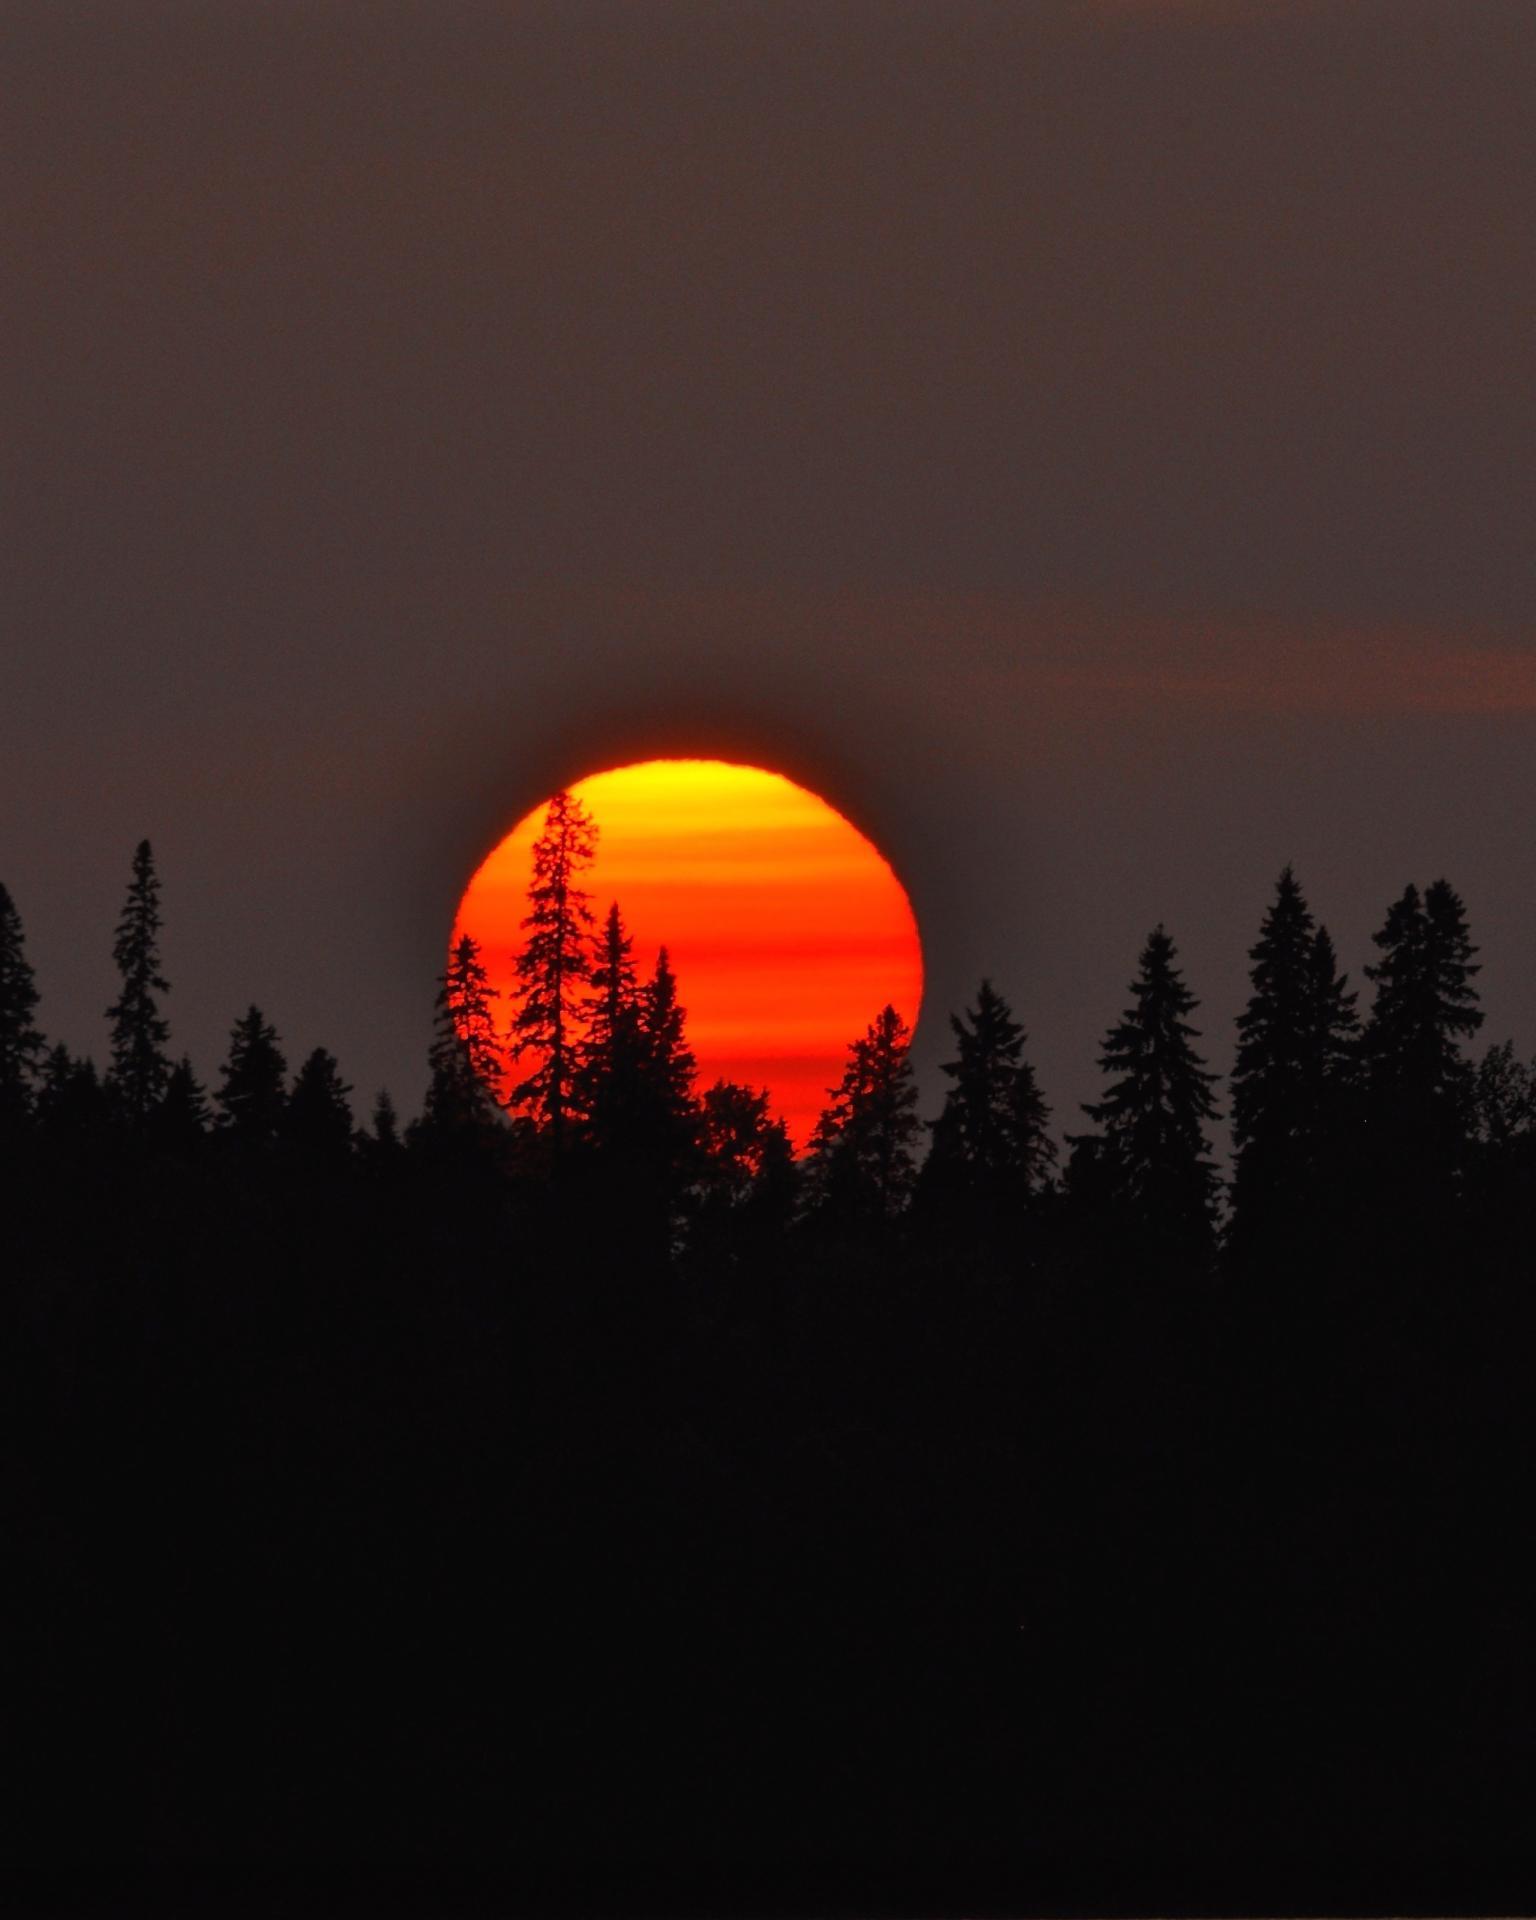 Orange moon rising